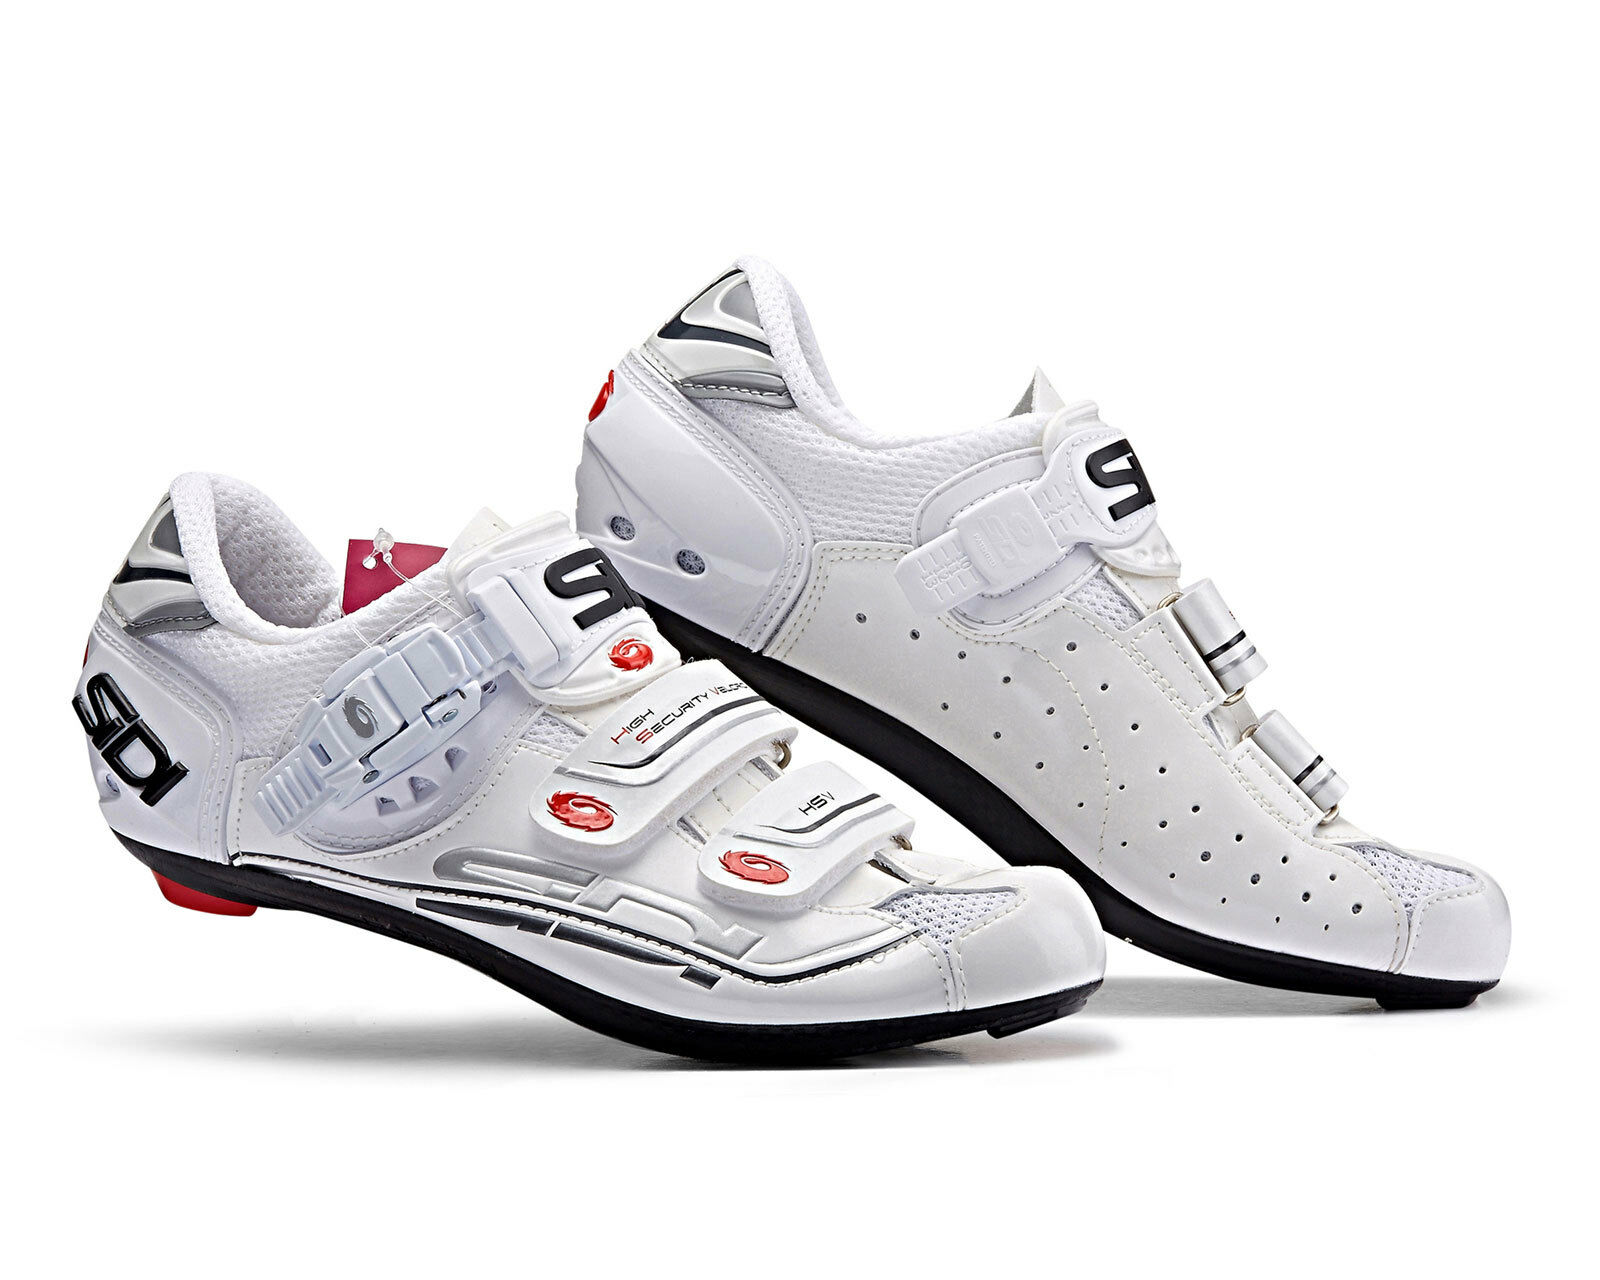 SIDI Genius 7 Woman Road Cycling shoes - White White